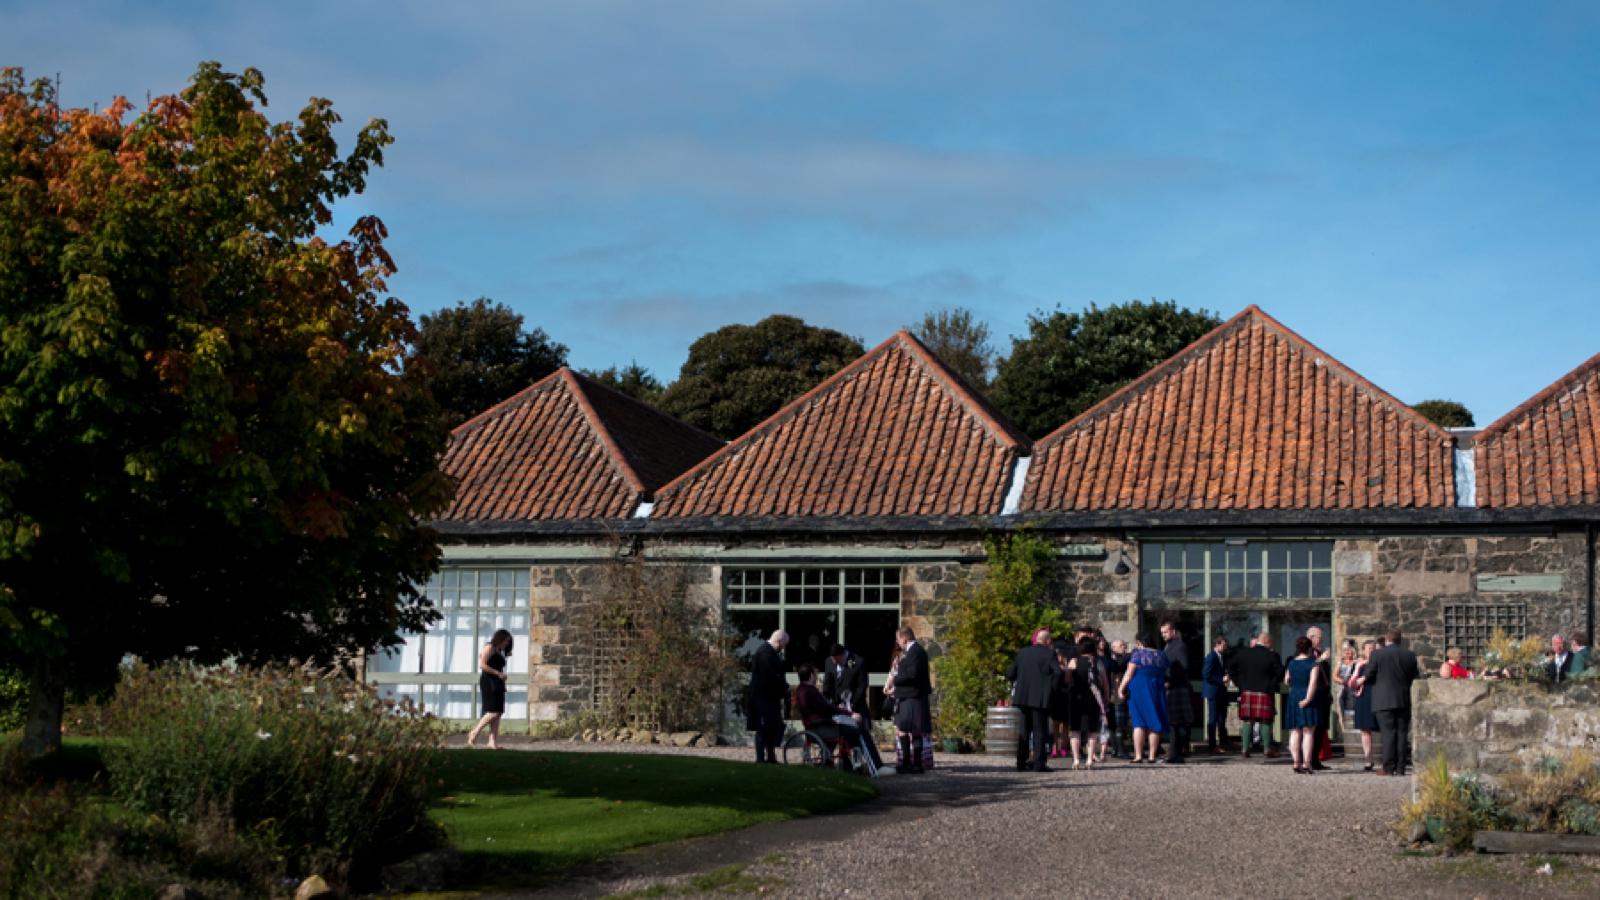 2017-09-23 (Mearns) Pratis Farm Wedding Photography124156.jpg